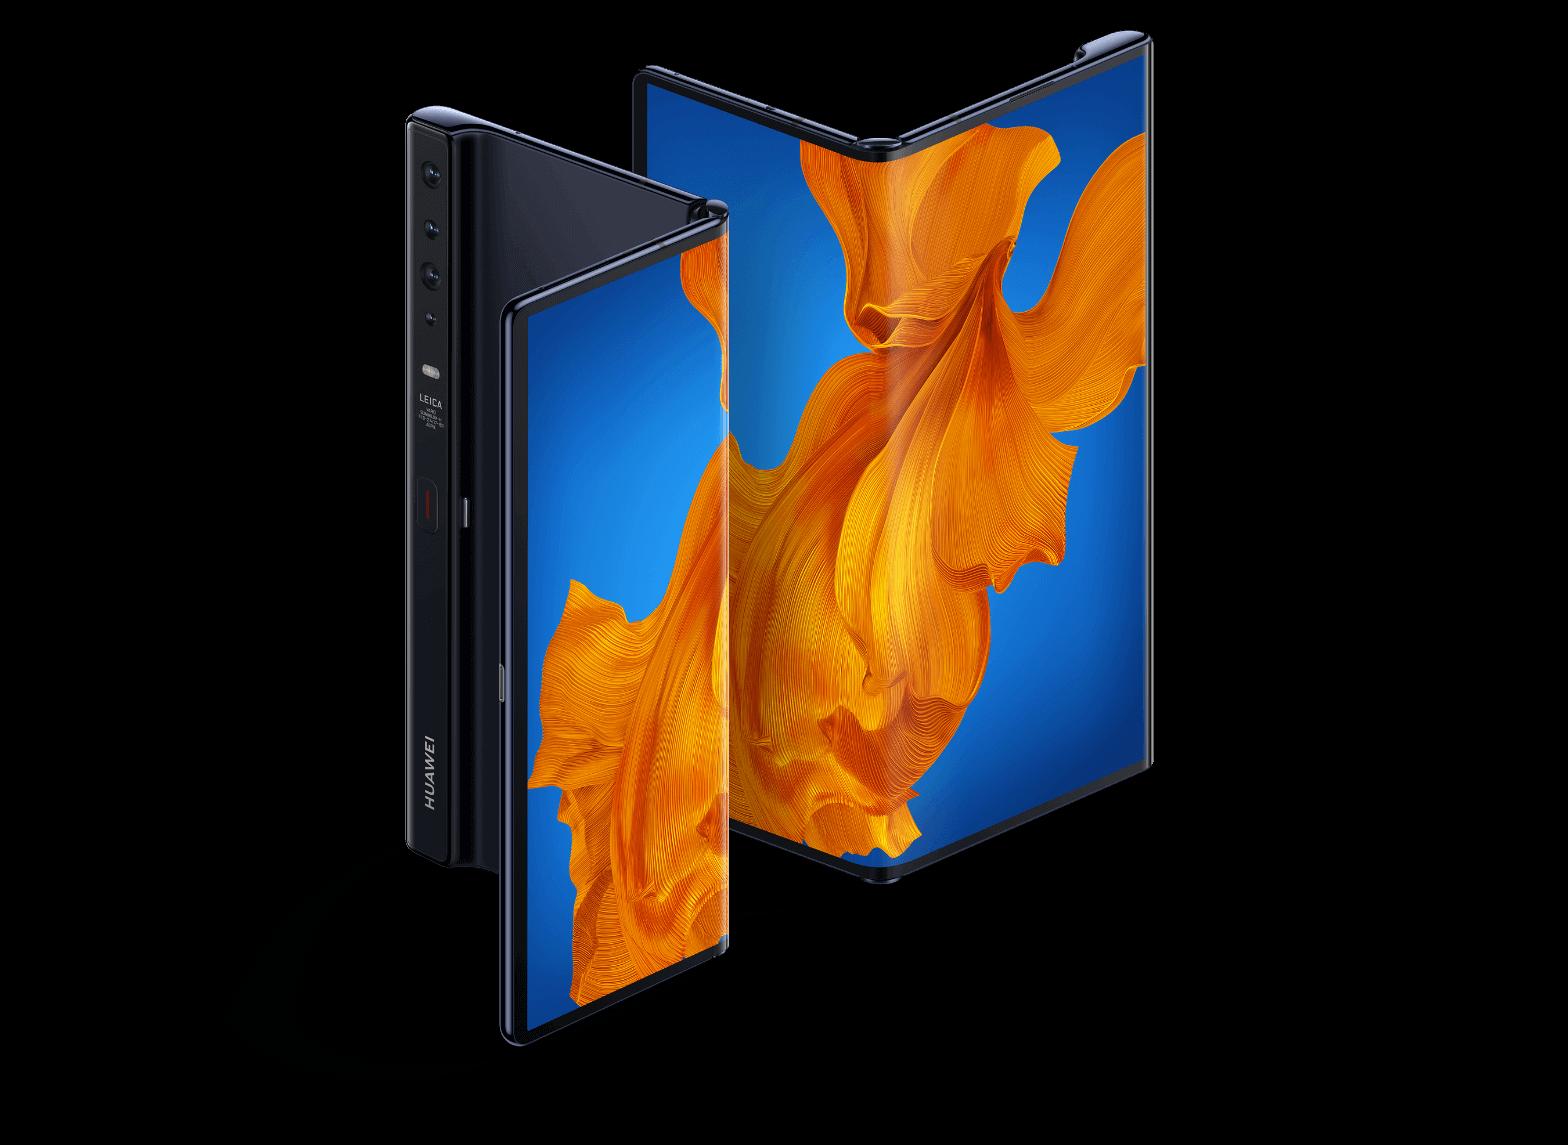 HUAWEI MATE XS 5G, 8GB RAM, 512GB, INTERSTELLAR BLUE